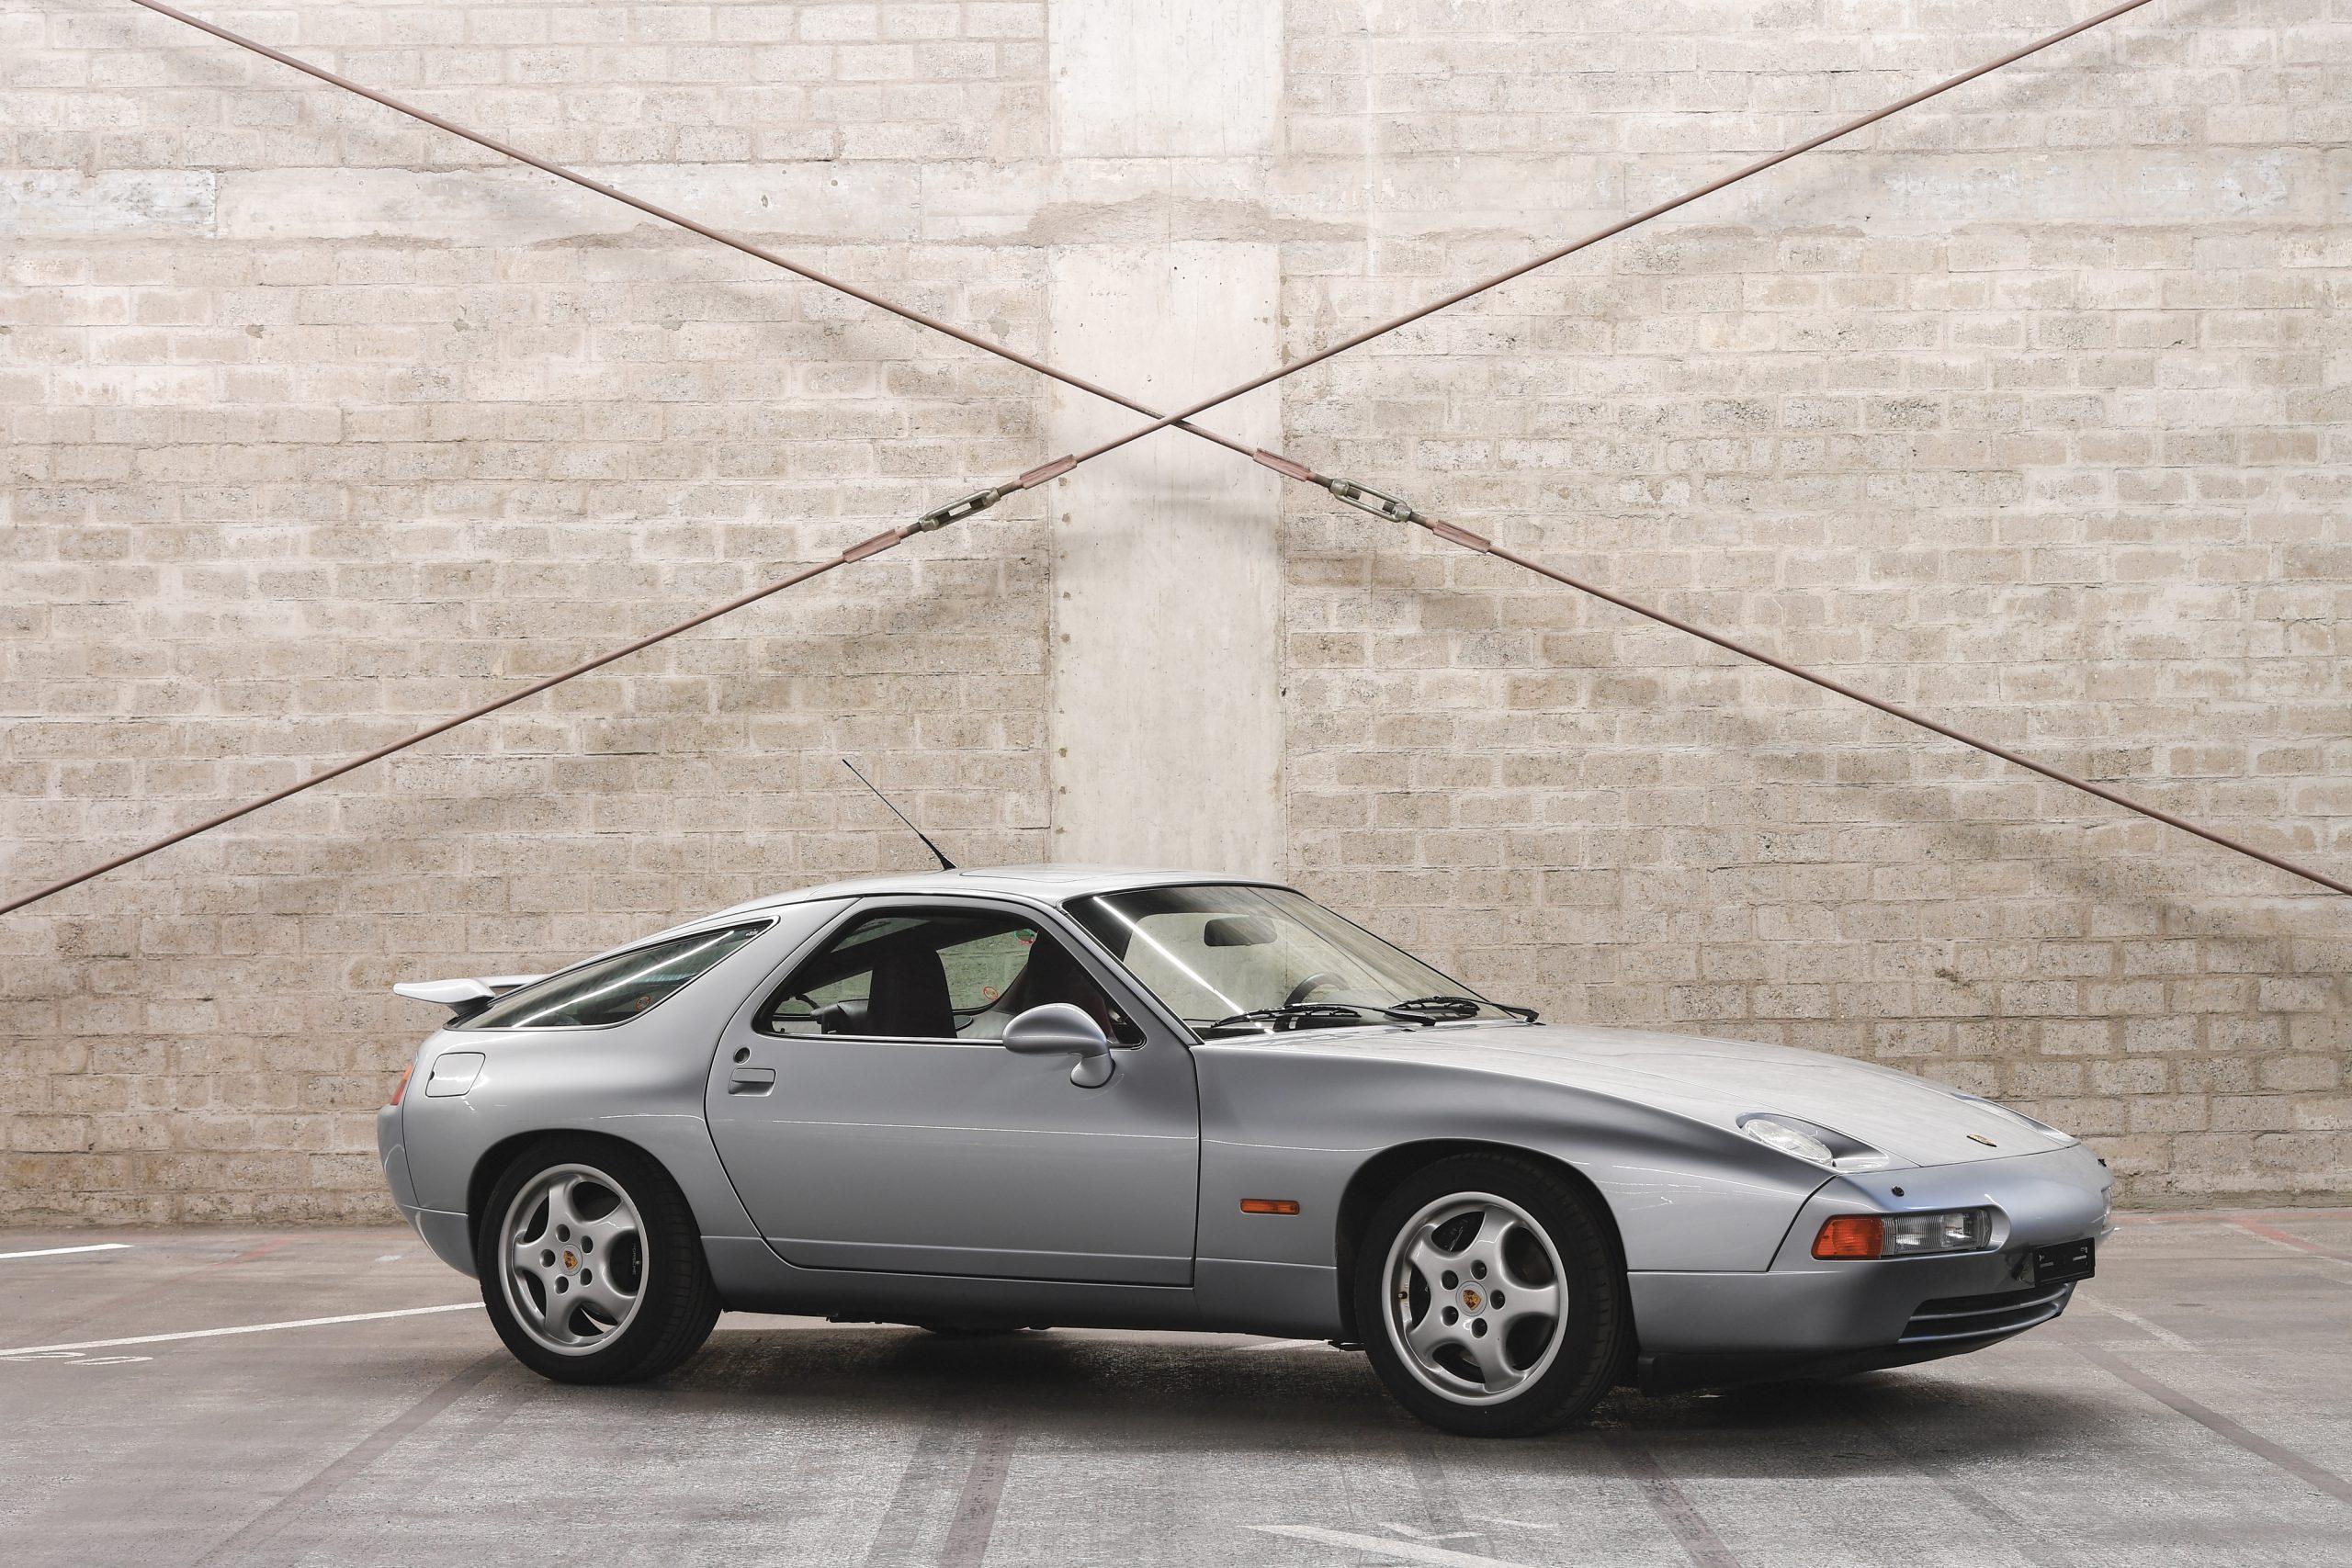 1992 Porsche 928 GTS Front Three-Quarter